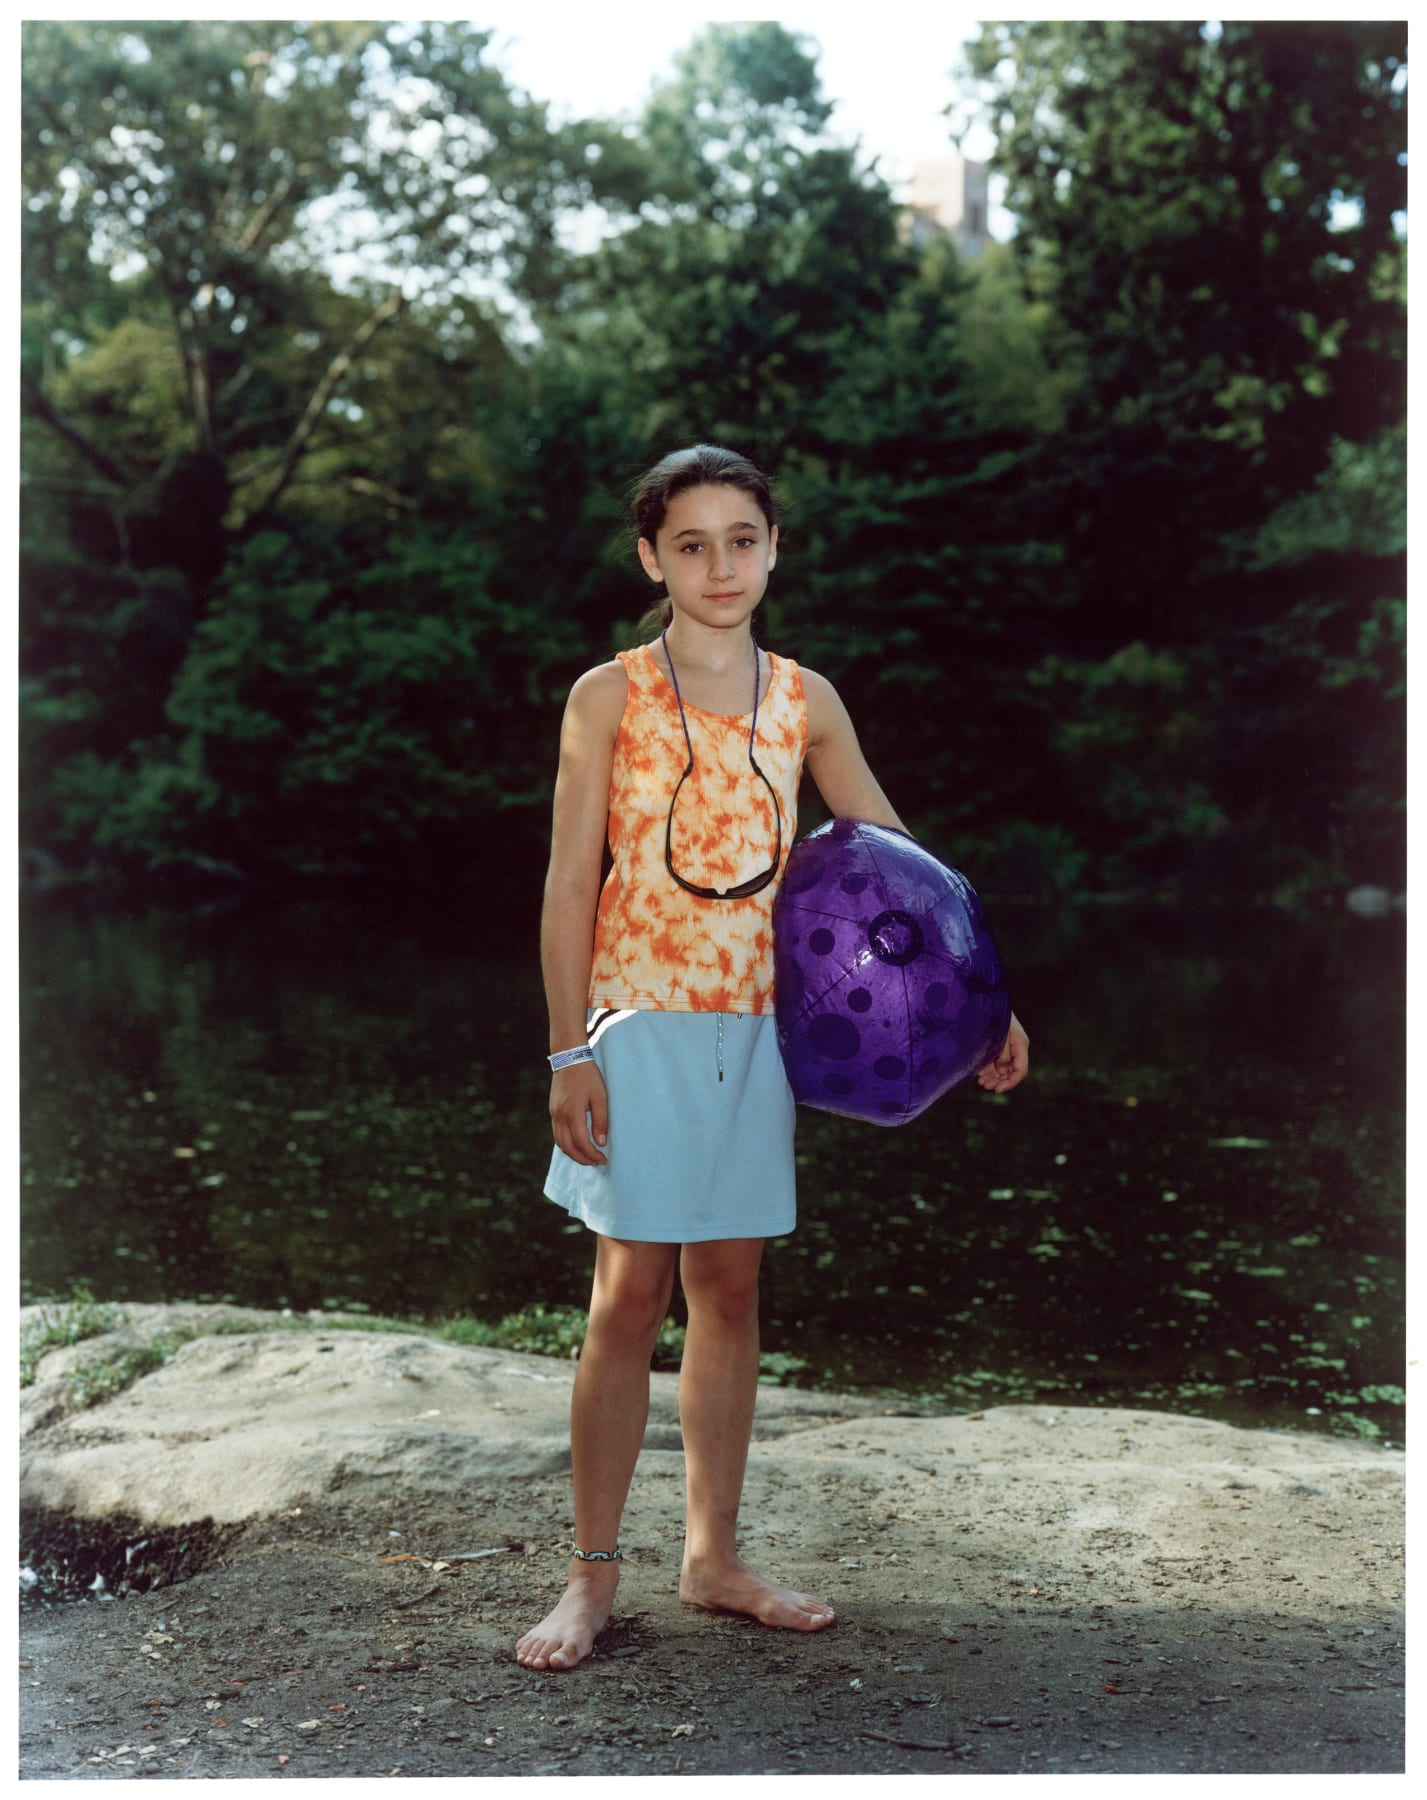 Rineke Dijkstra, Central Park, New York, August 18, 2005, 2005